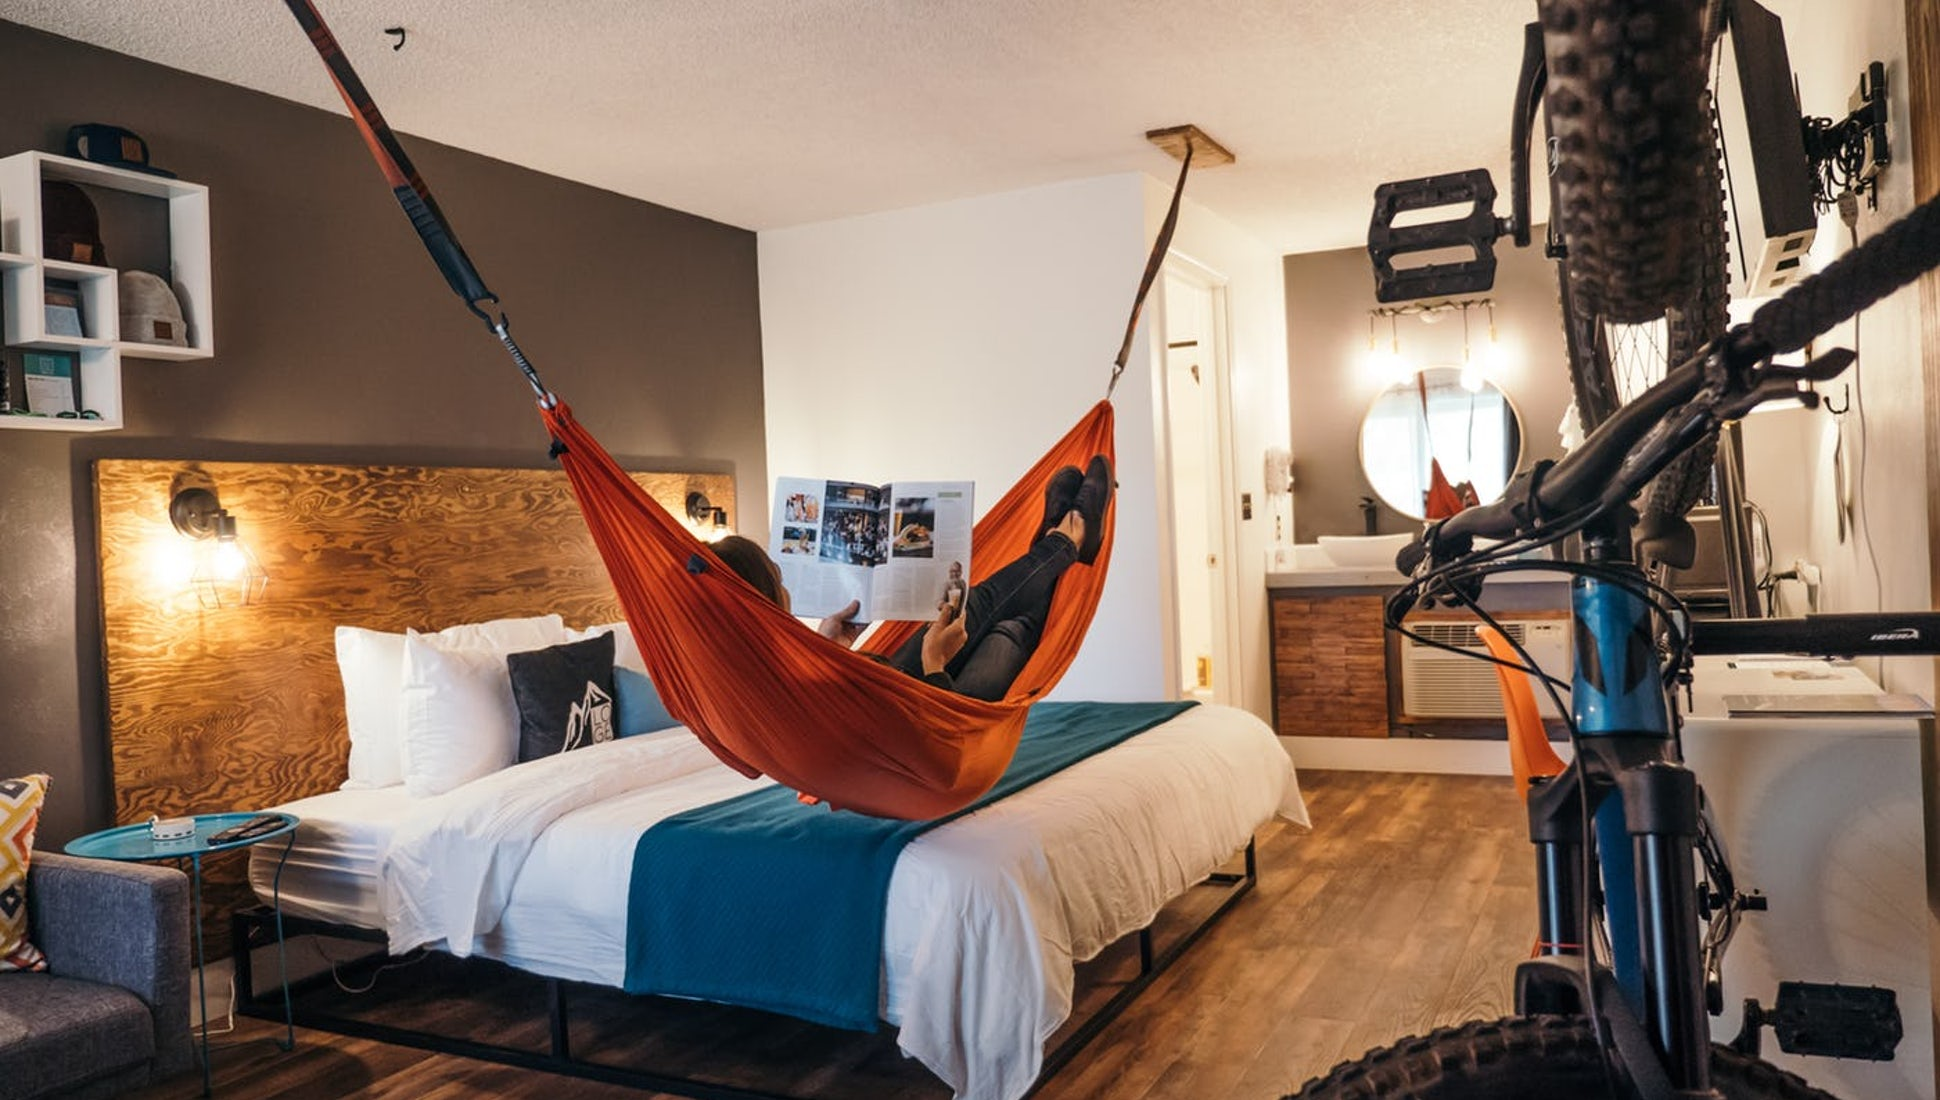 A Mountain Biker's Dream Hotel: LOGE Bend, Oregon